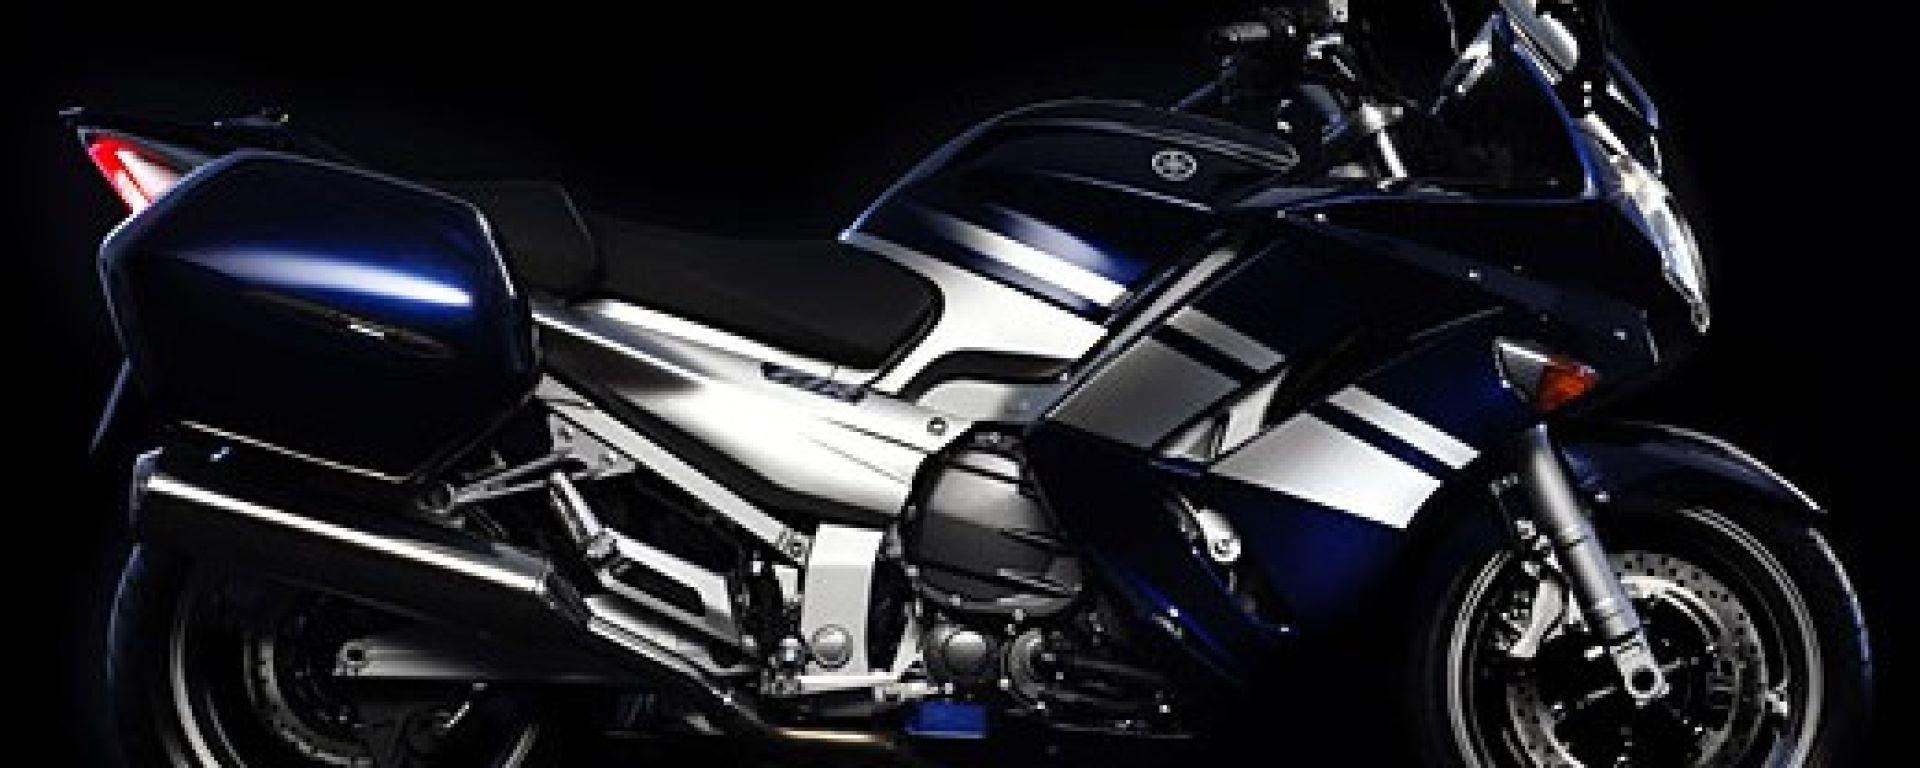 Novità Yamaha 2006